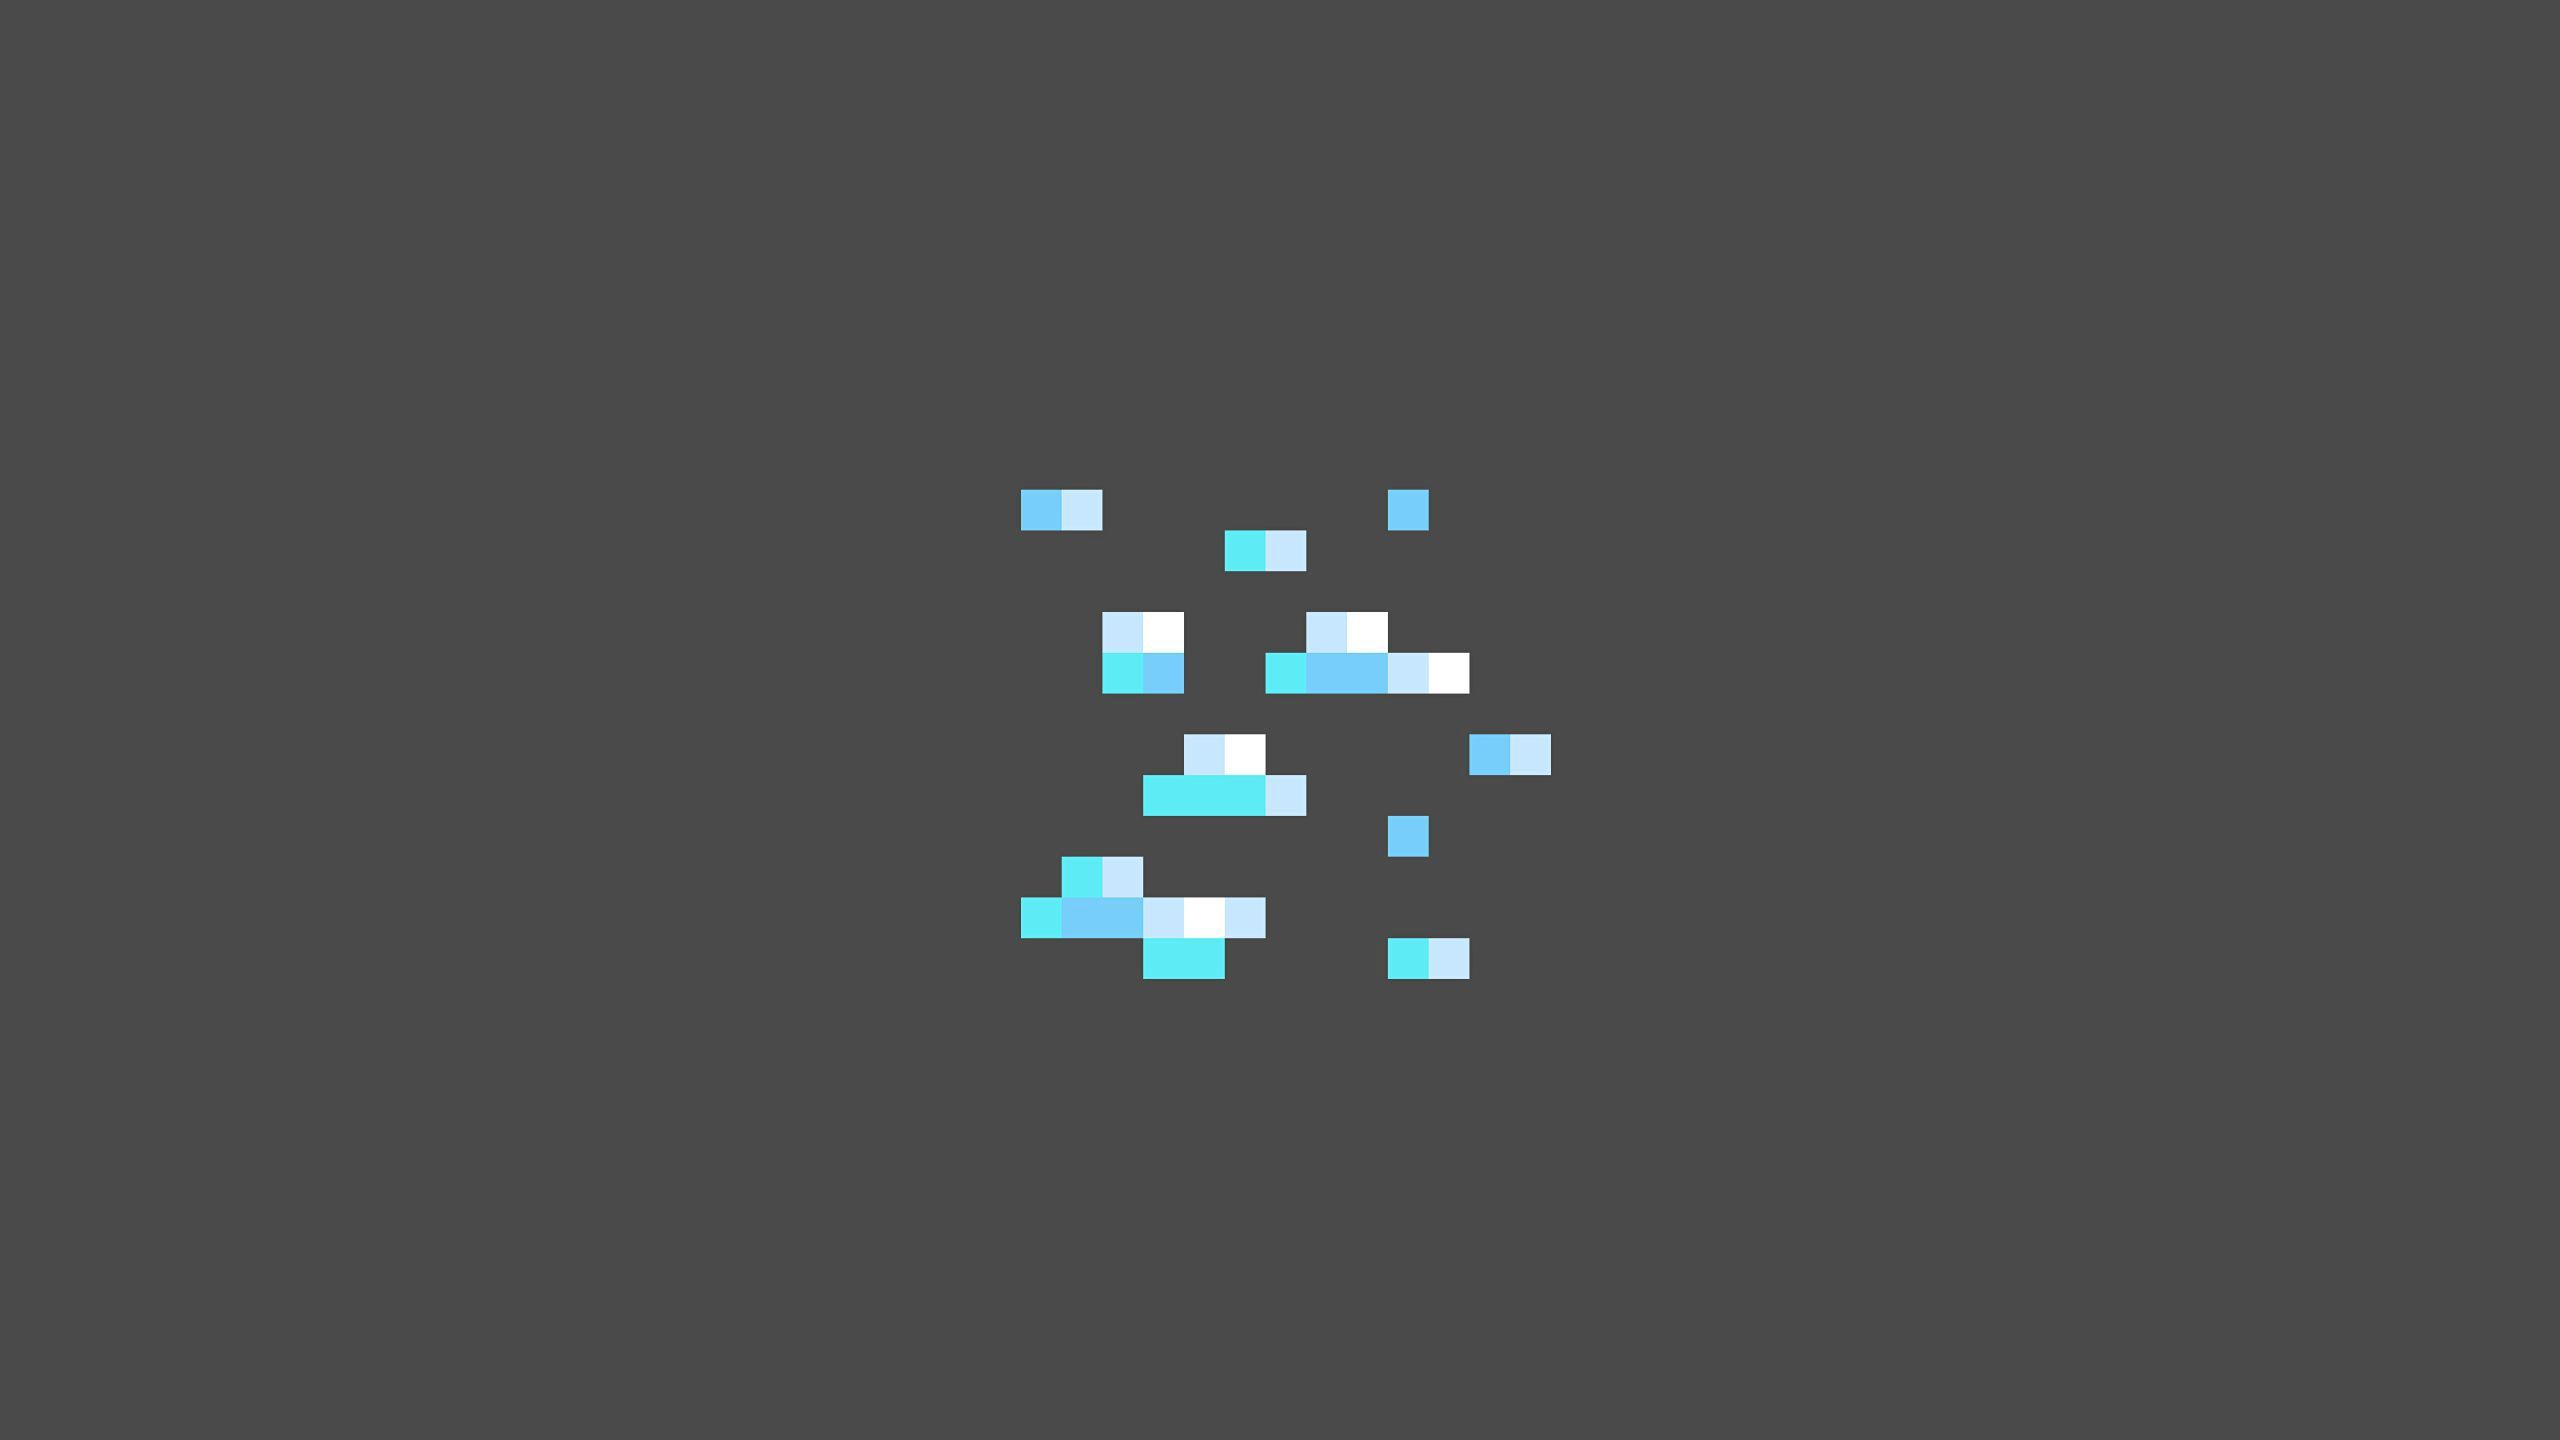 Diamond Ore   Minecraft Wallpaper 15749 2560x1440